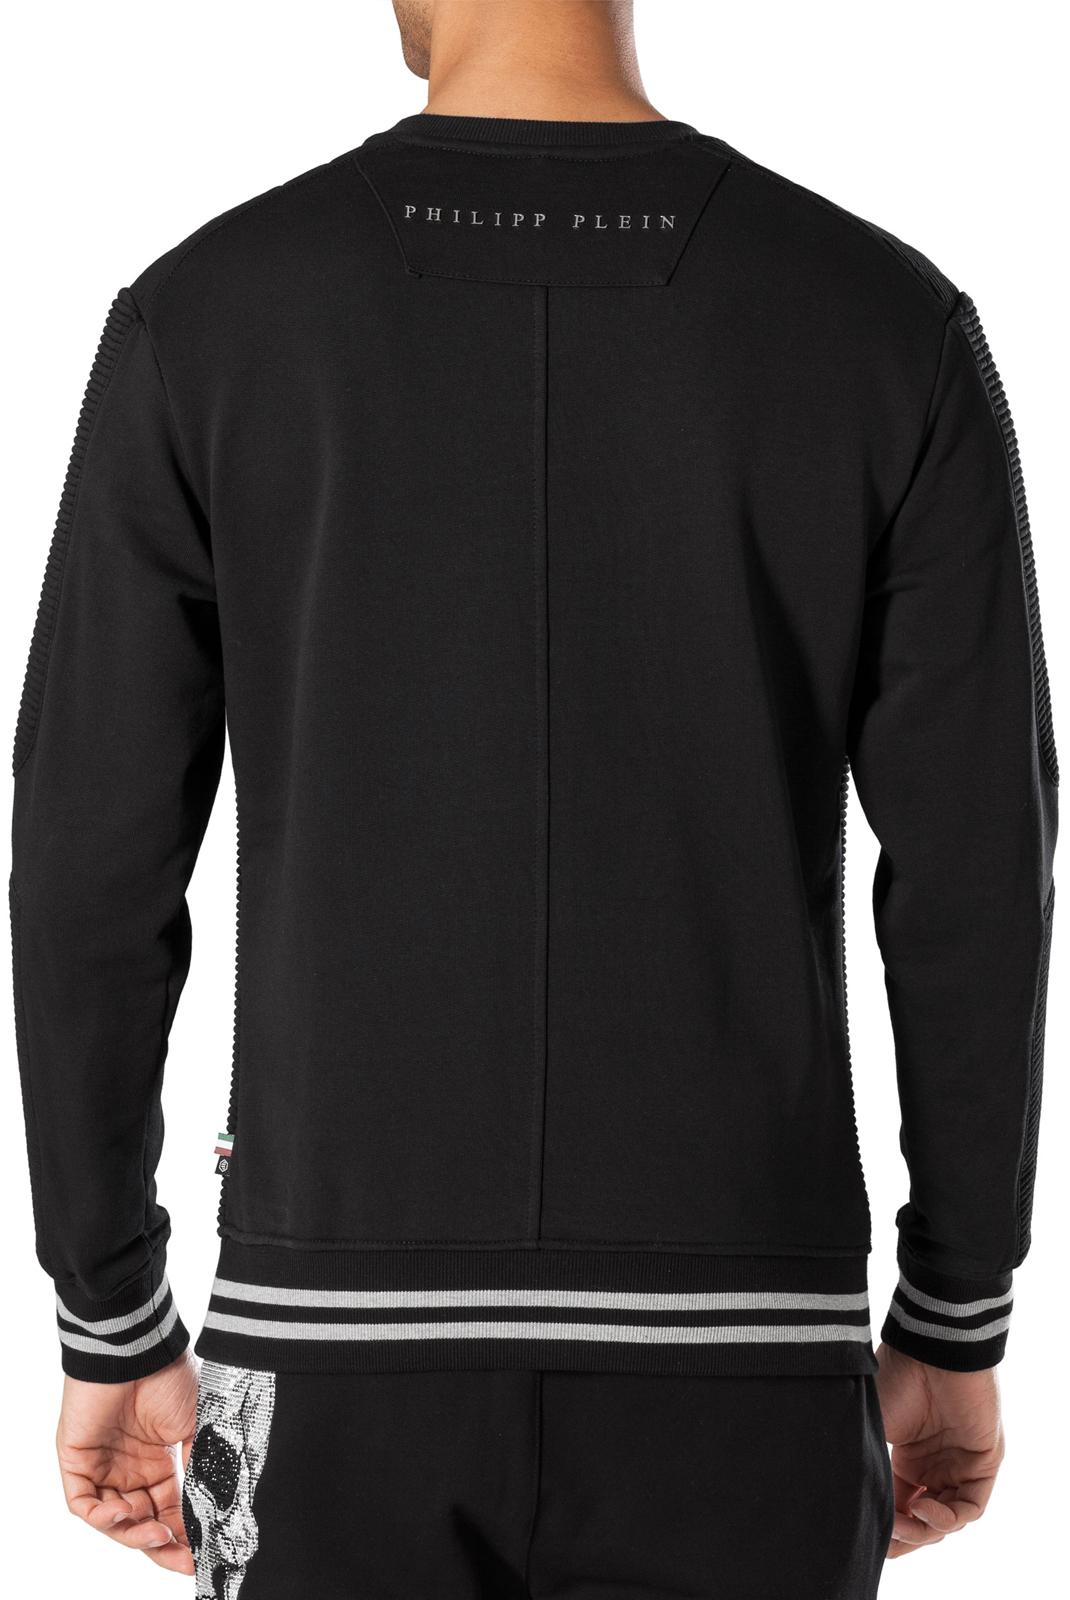 Sweatshirts  Philipp plein MJO0144 HOSHI 0202 BLACK/BLACK